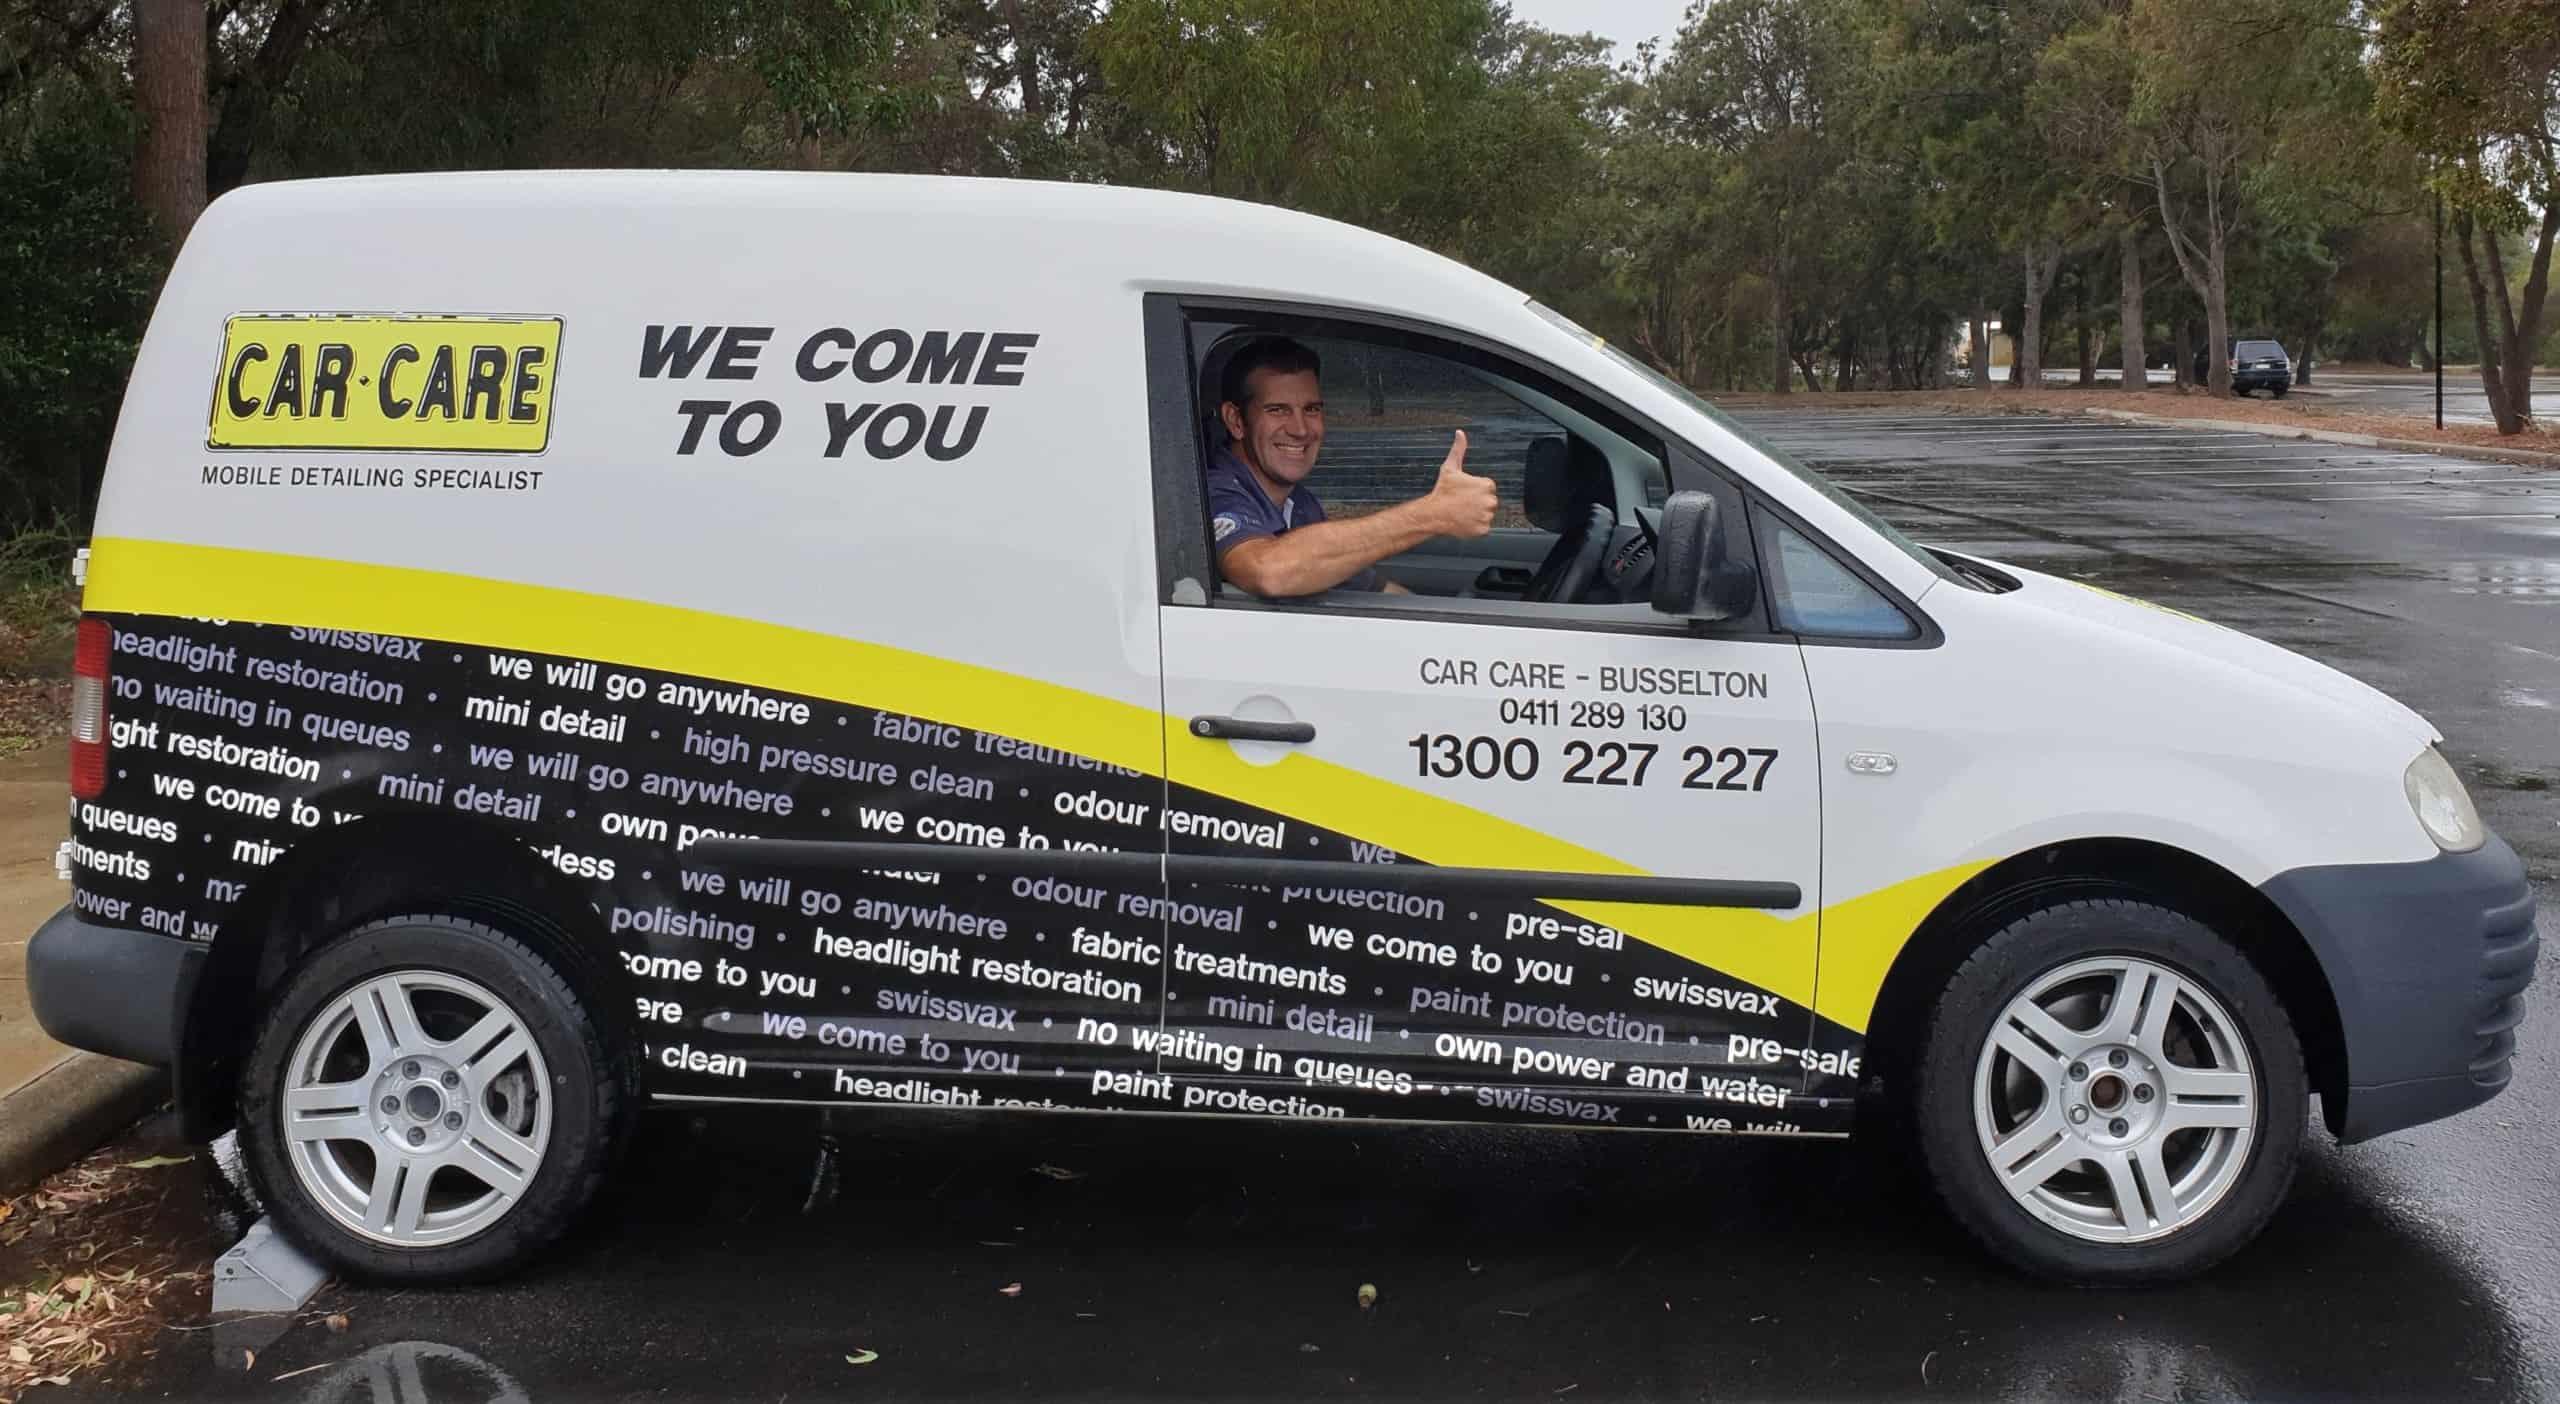 Tony Car Care Busselton in white VW van